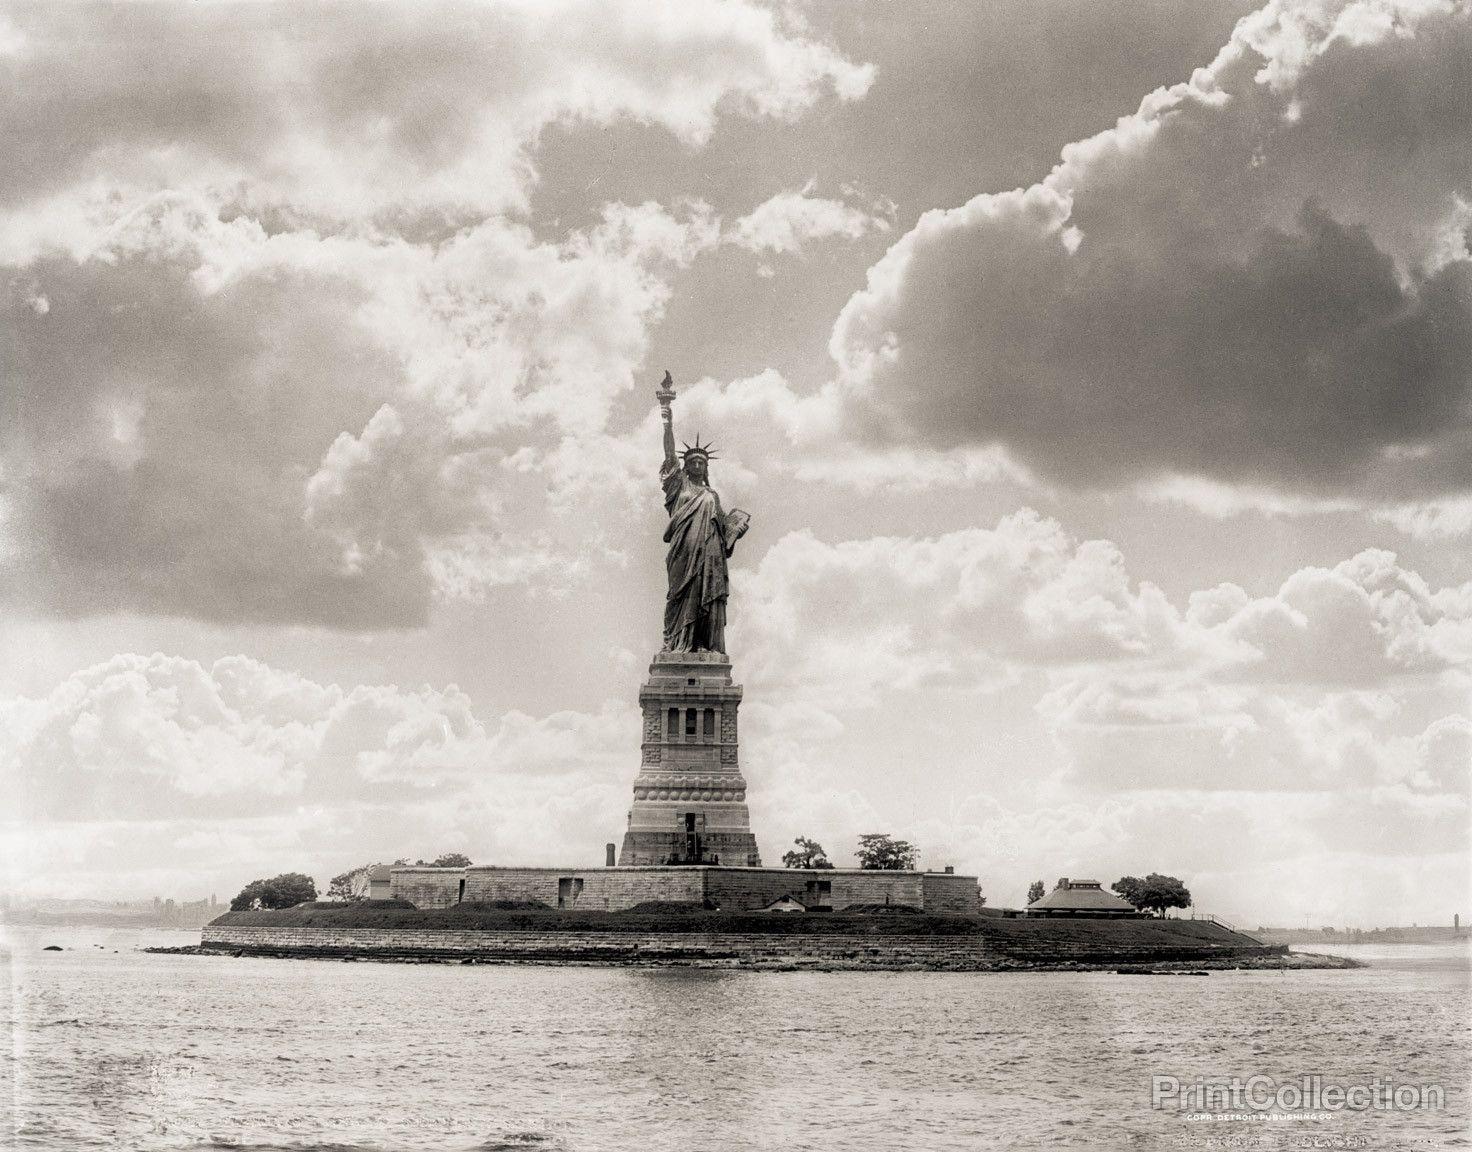 Statue of Liberty, New York Harbor, 1905